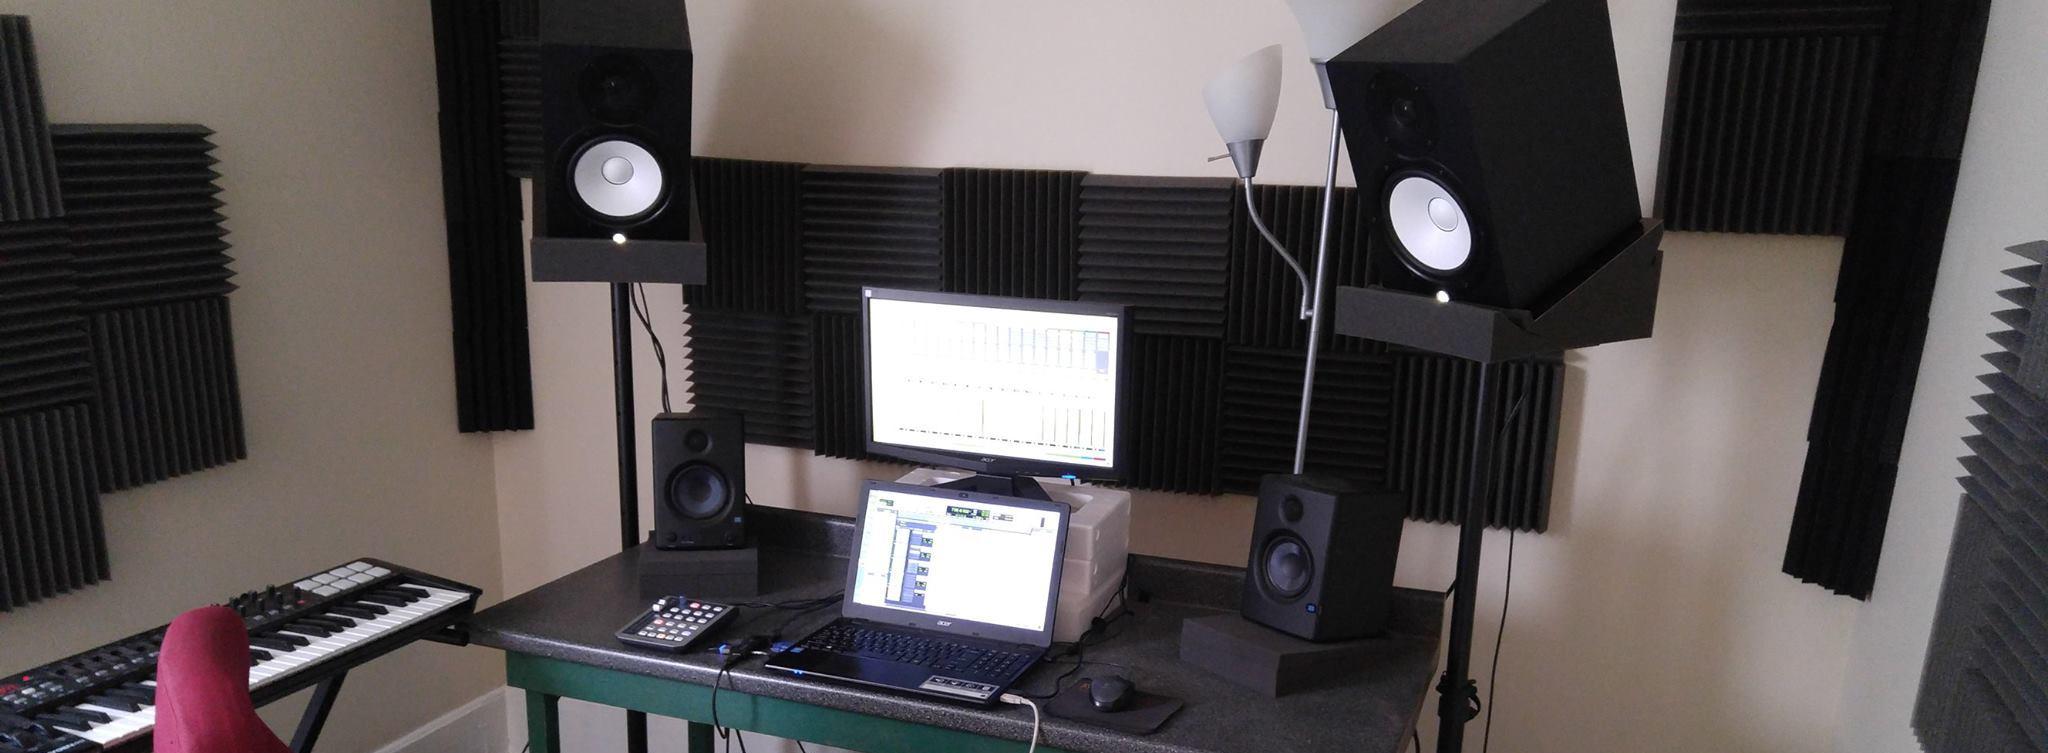 My_home_studio